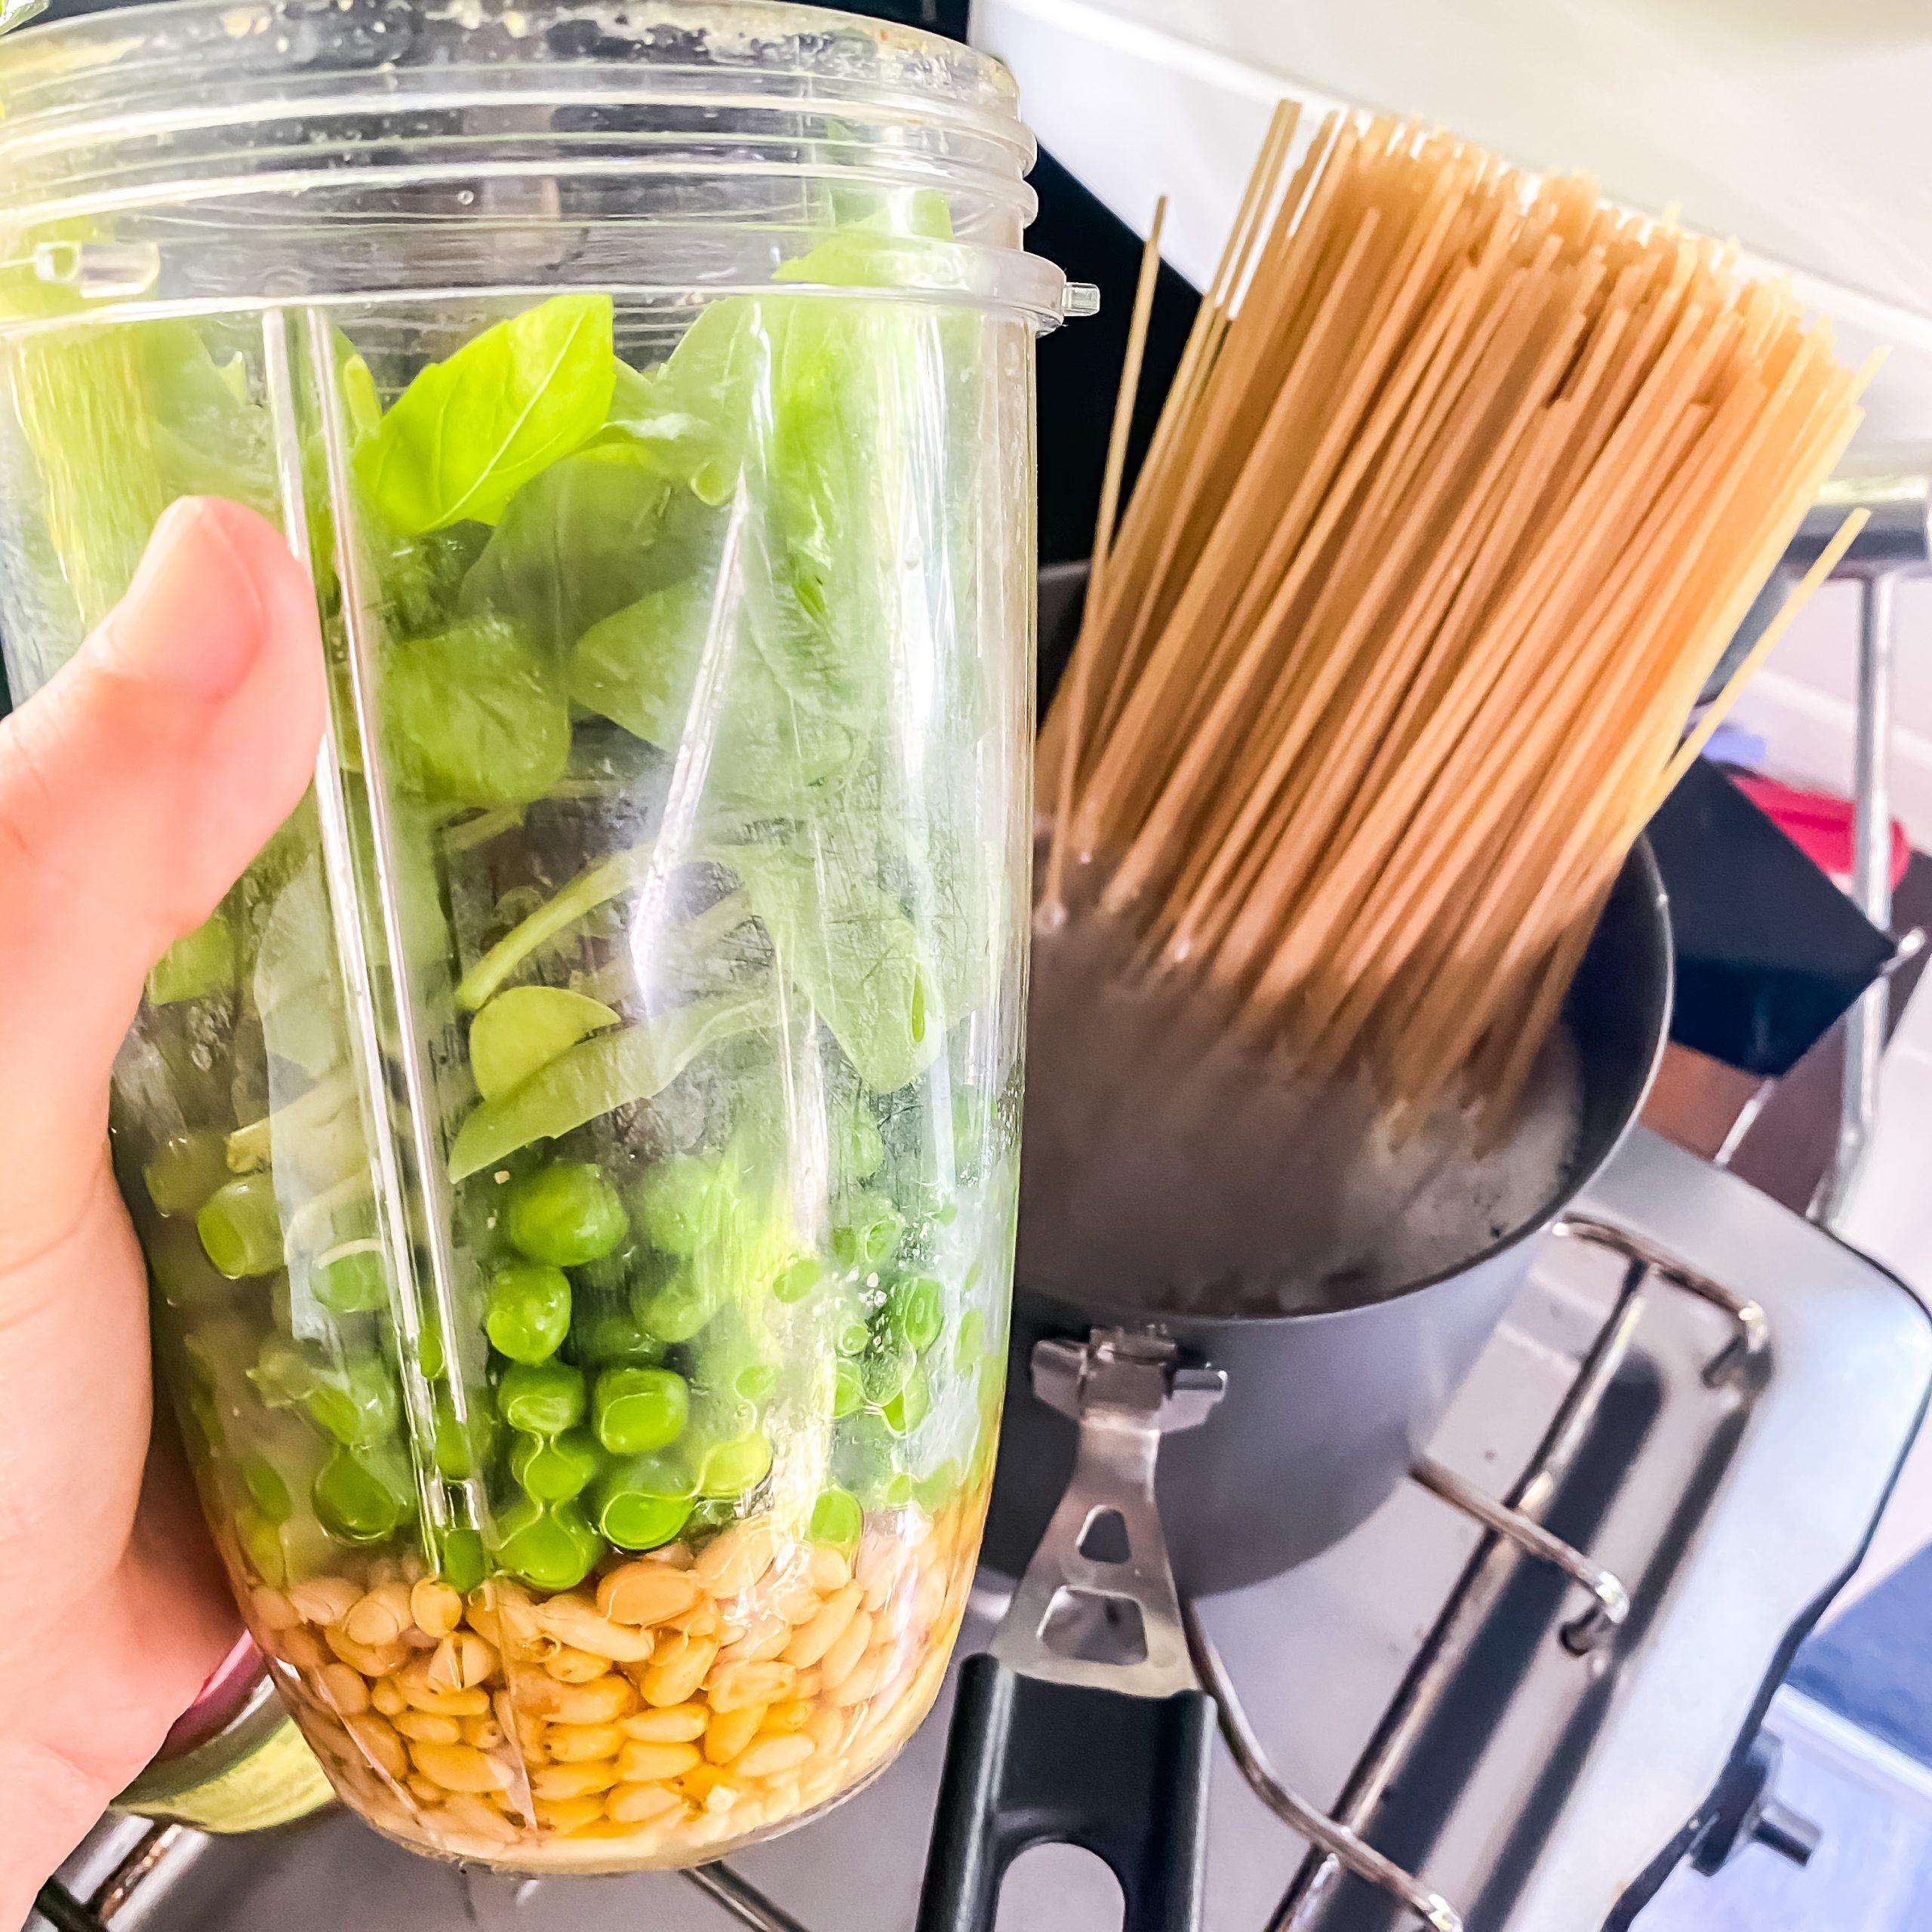 Pea Pesto Pasta Ingredients in a blender